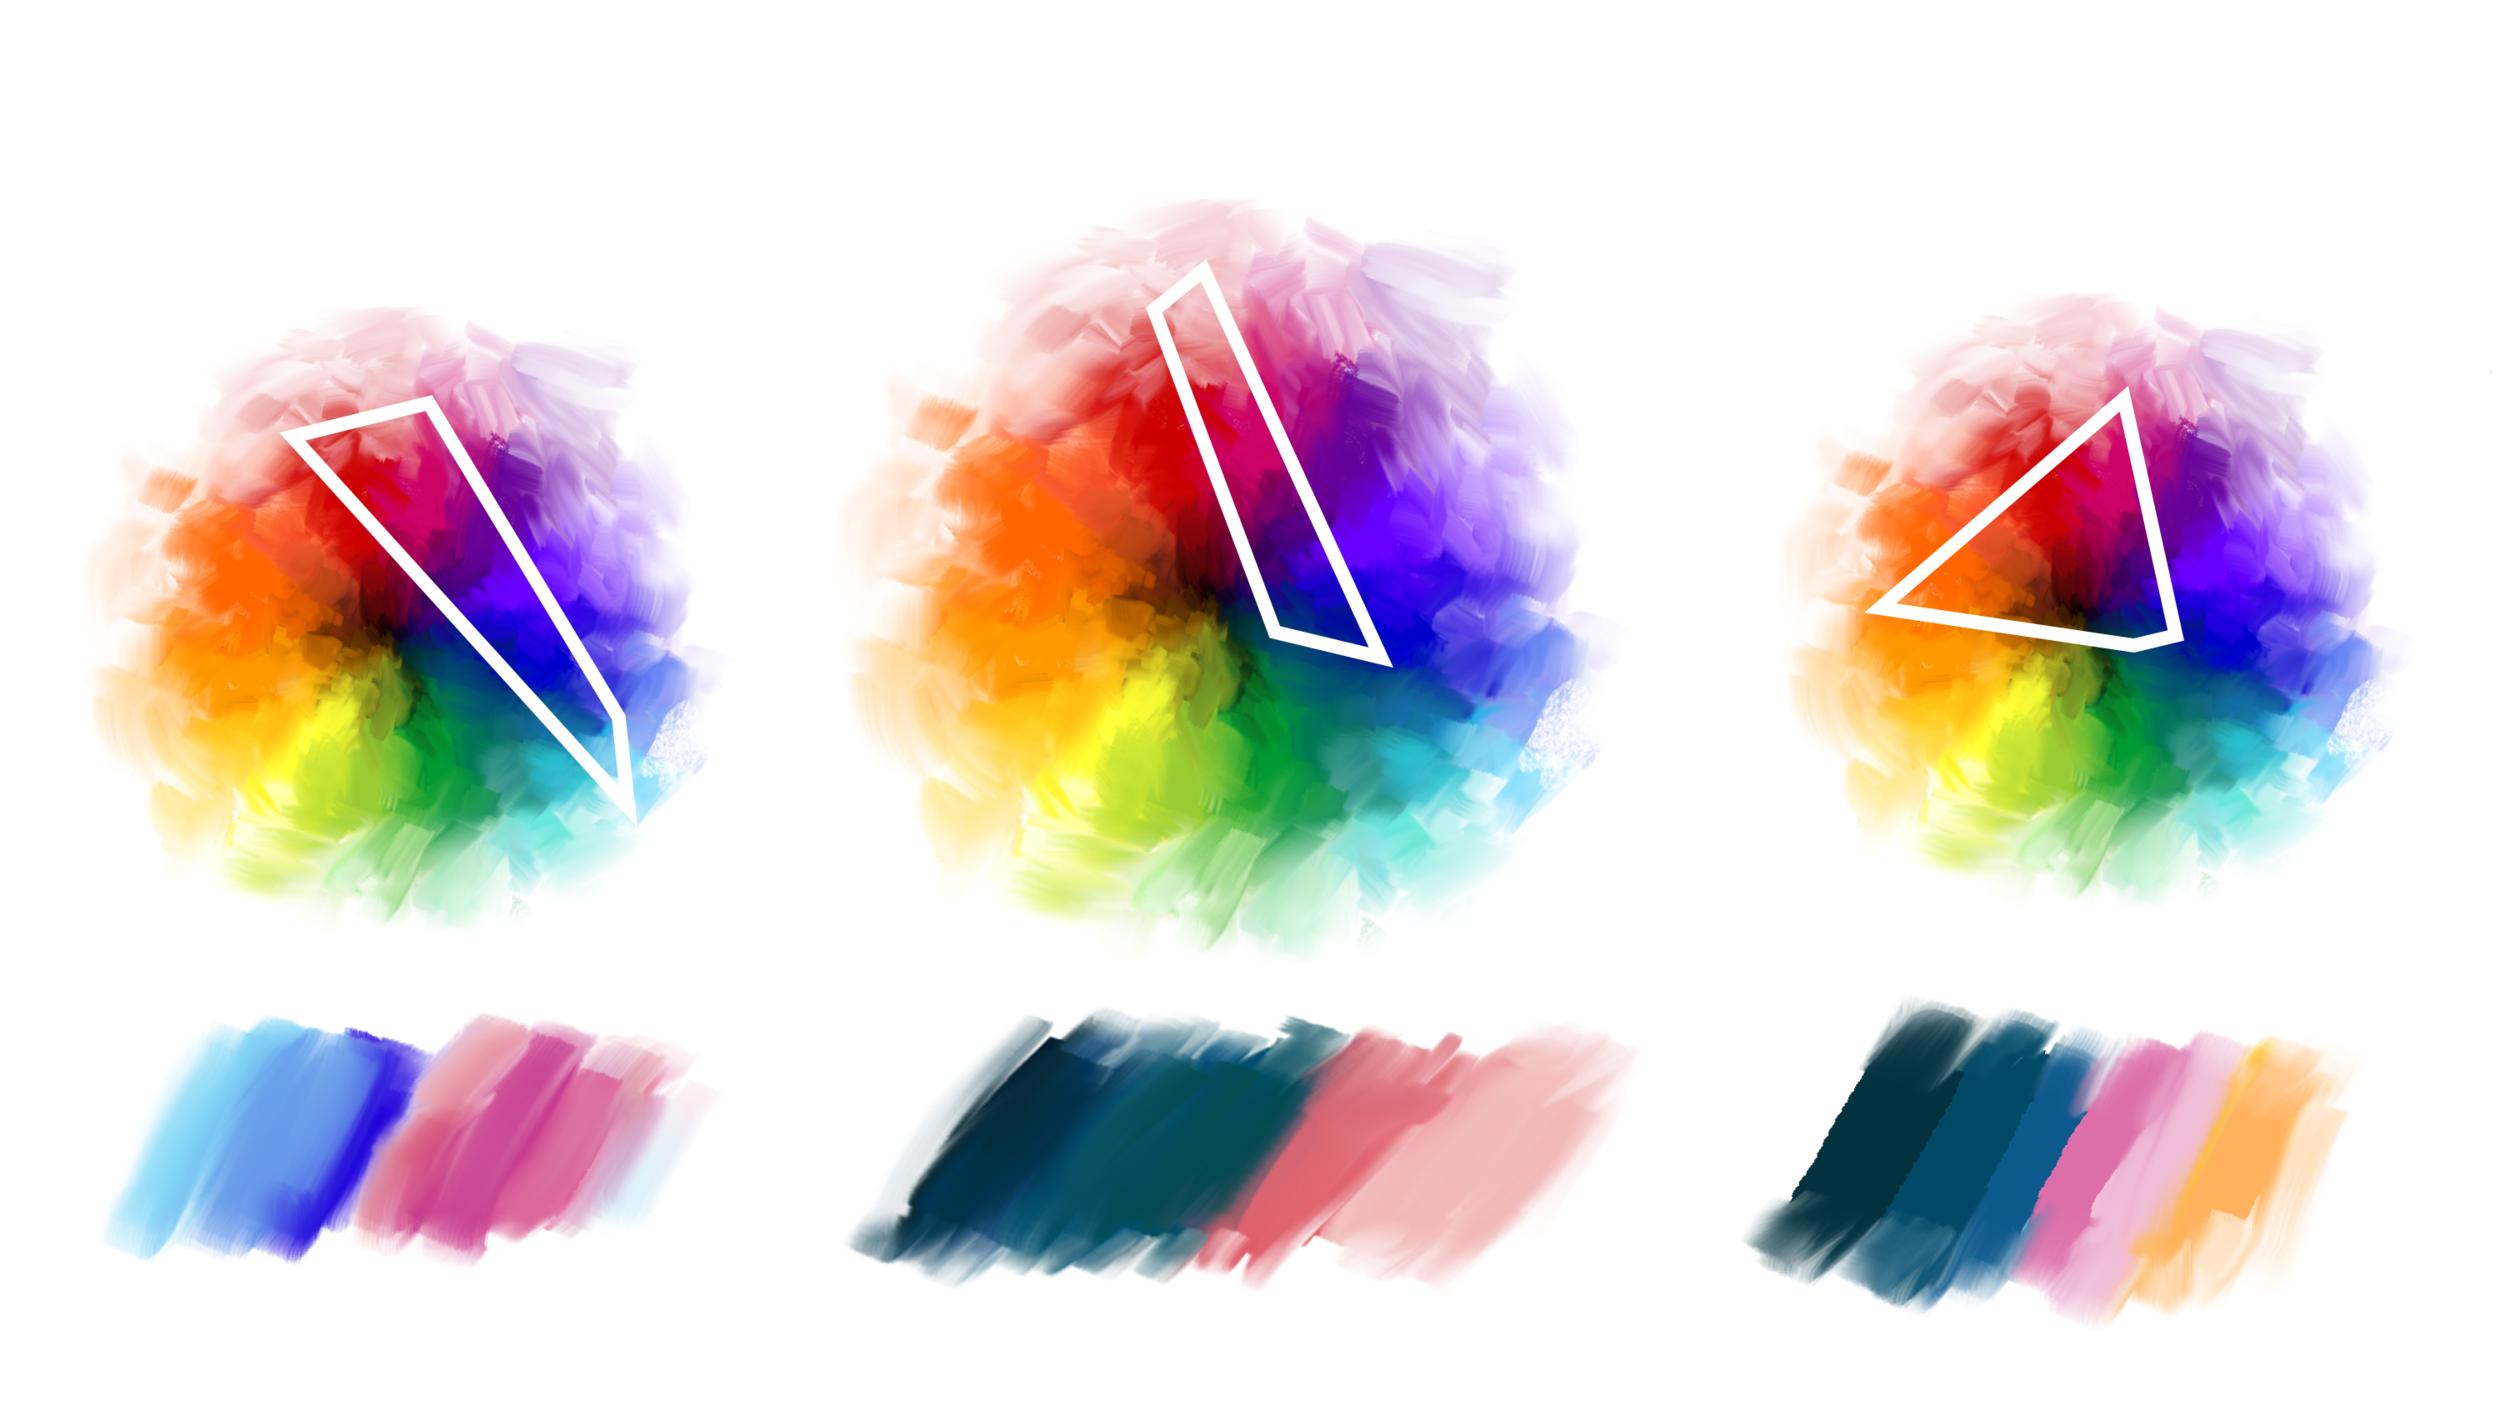 Color Test no text.png